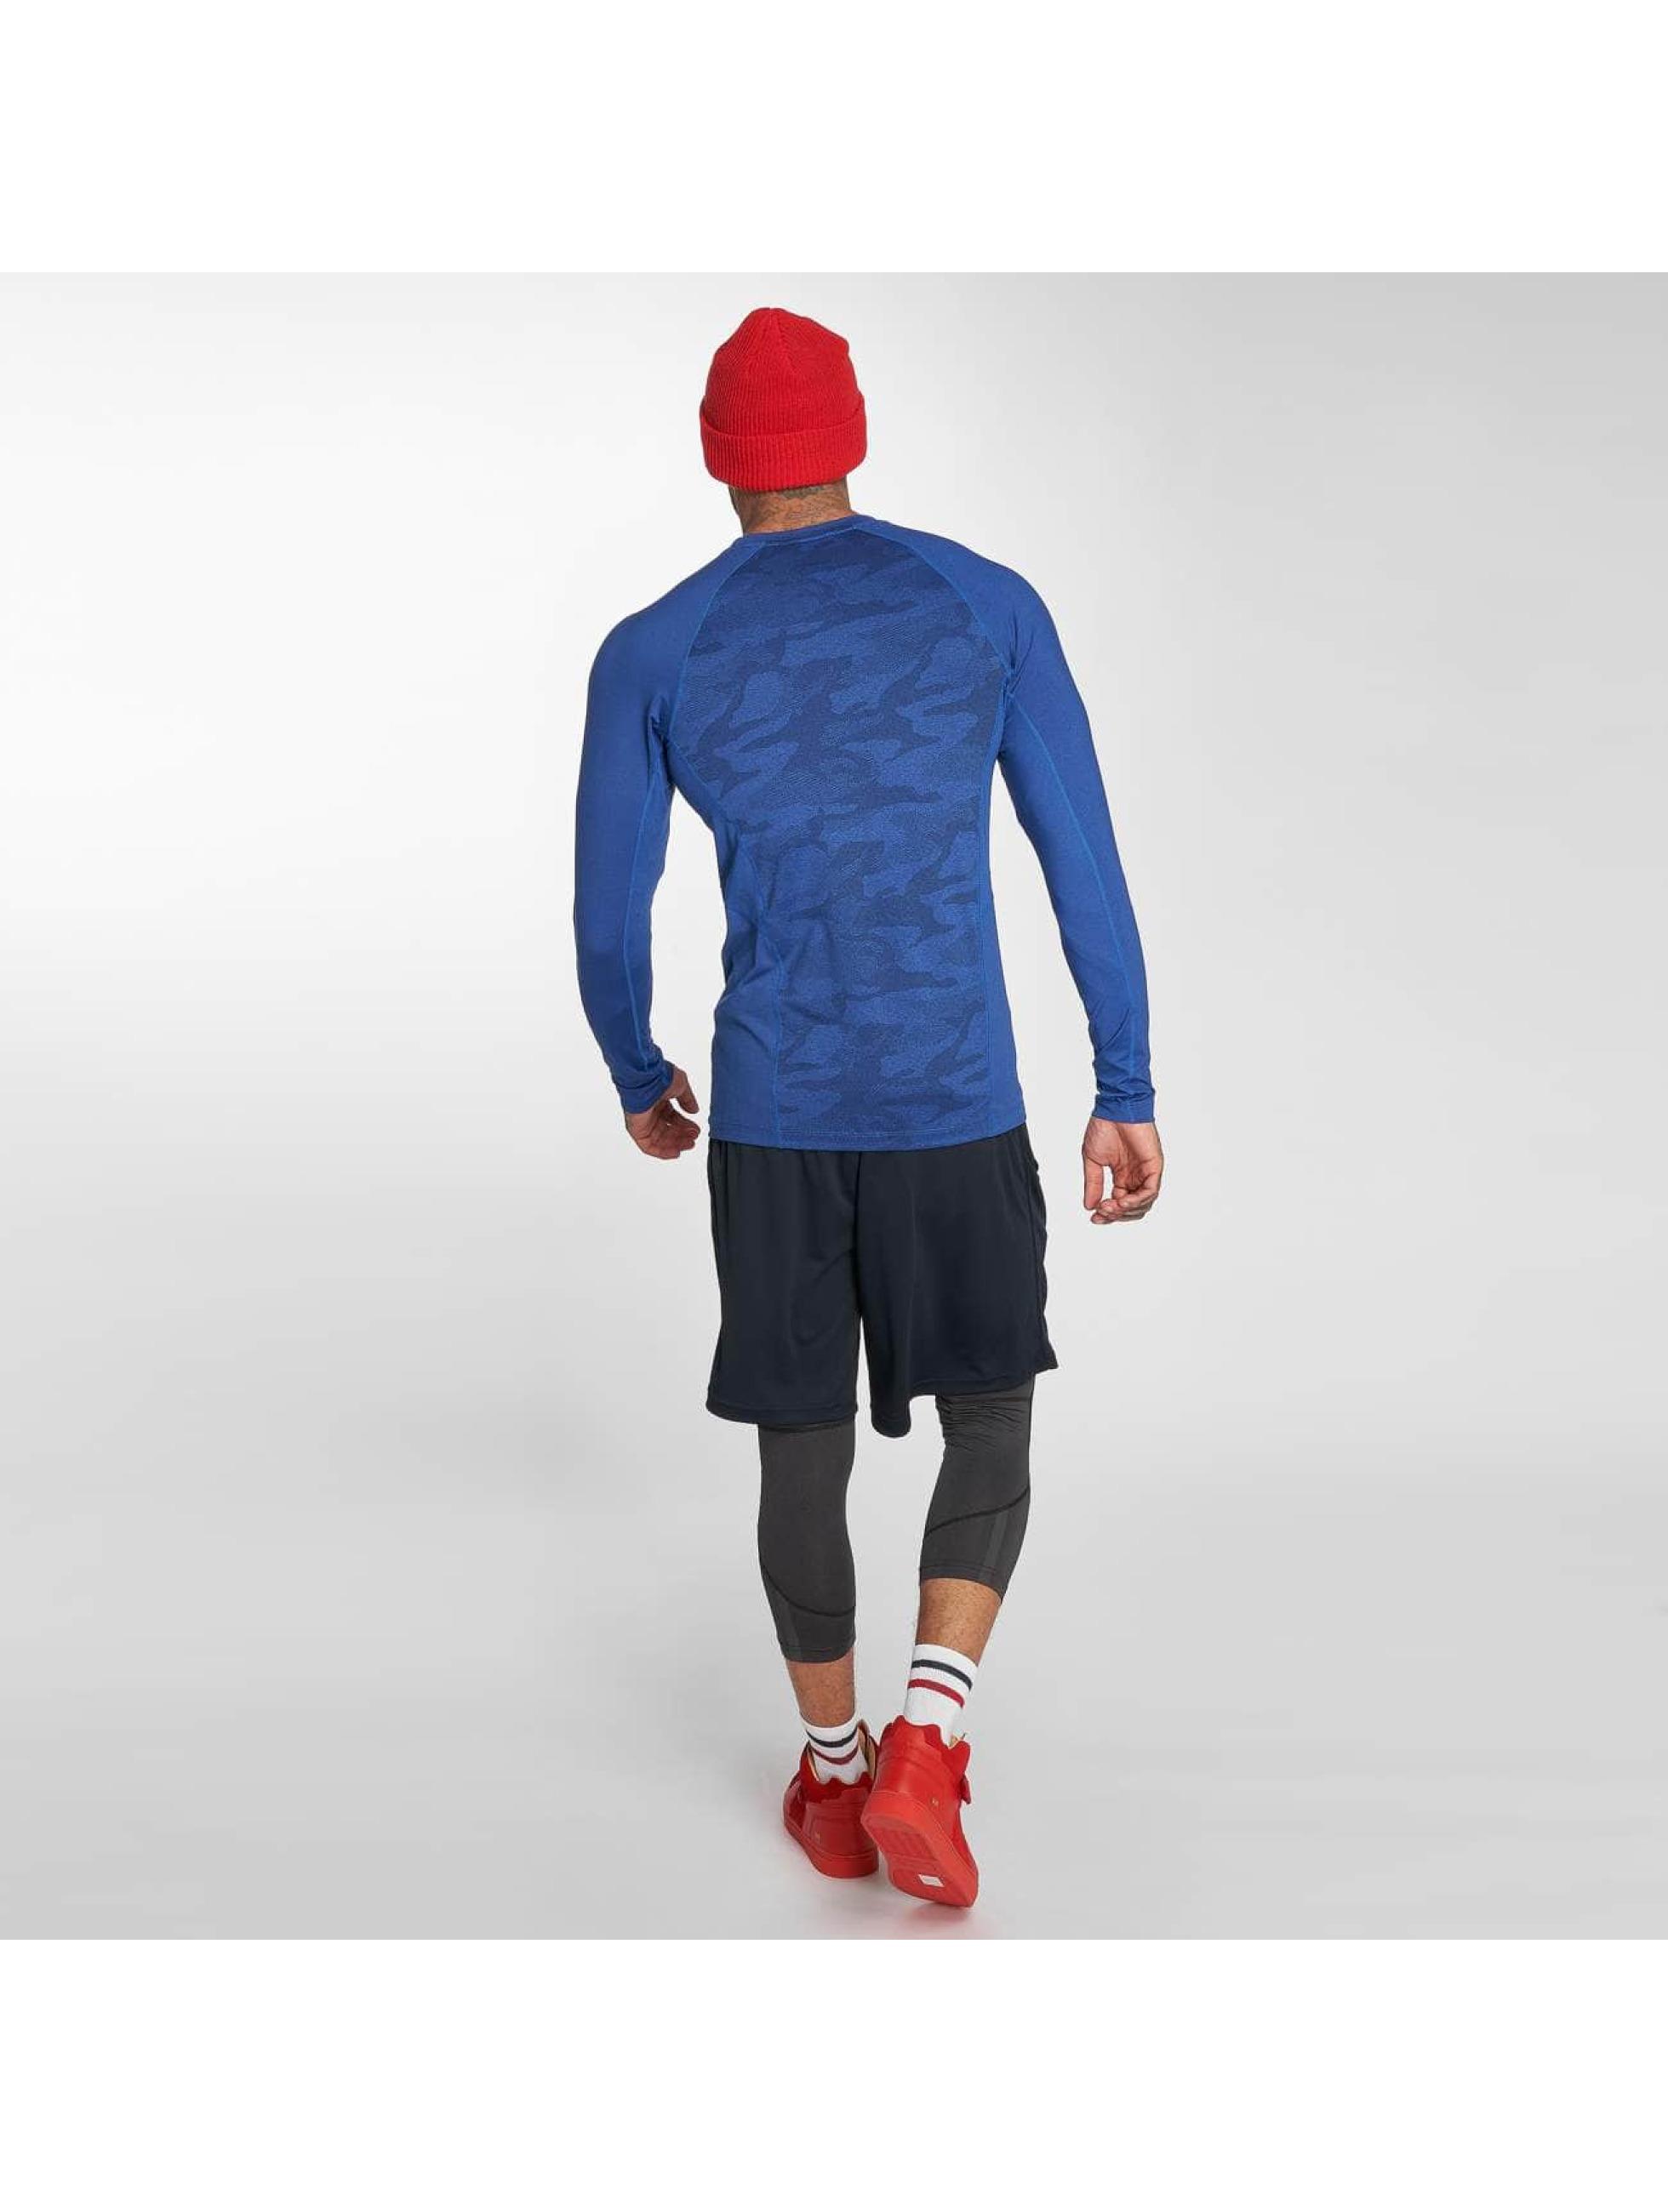 K1X Core T-Shirt manches longues Compression bleu